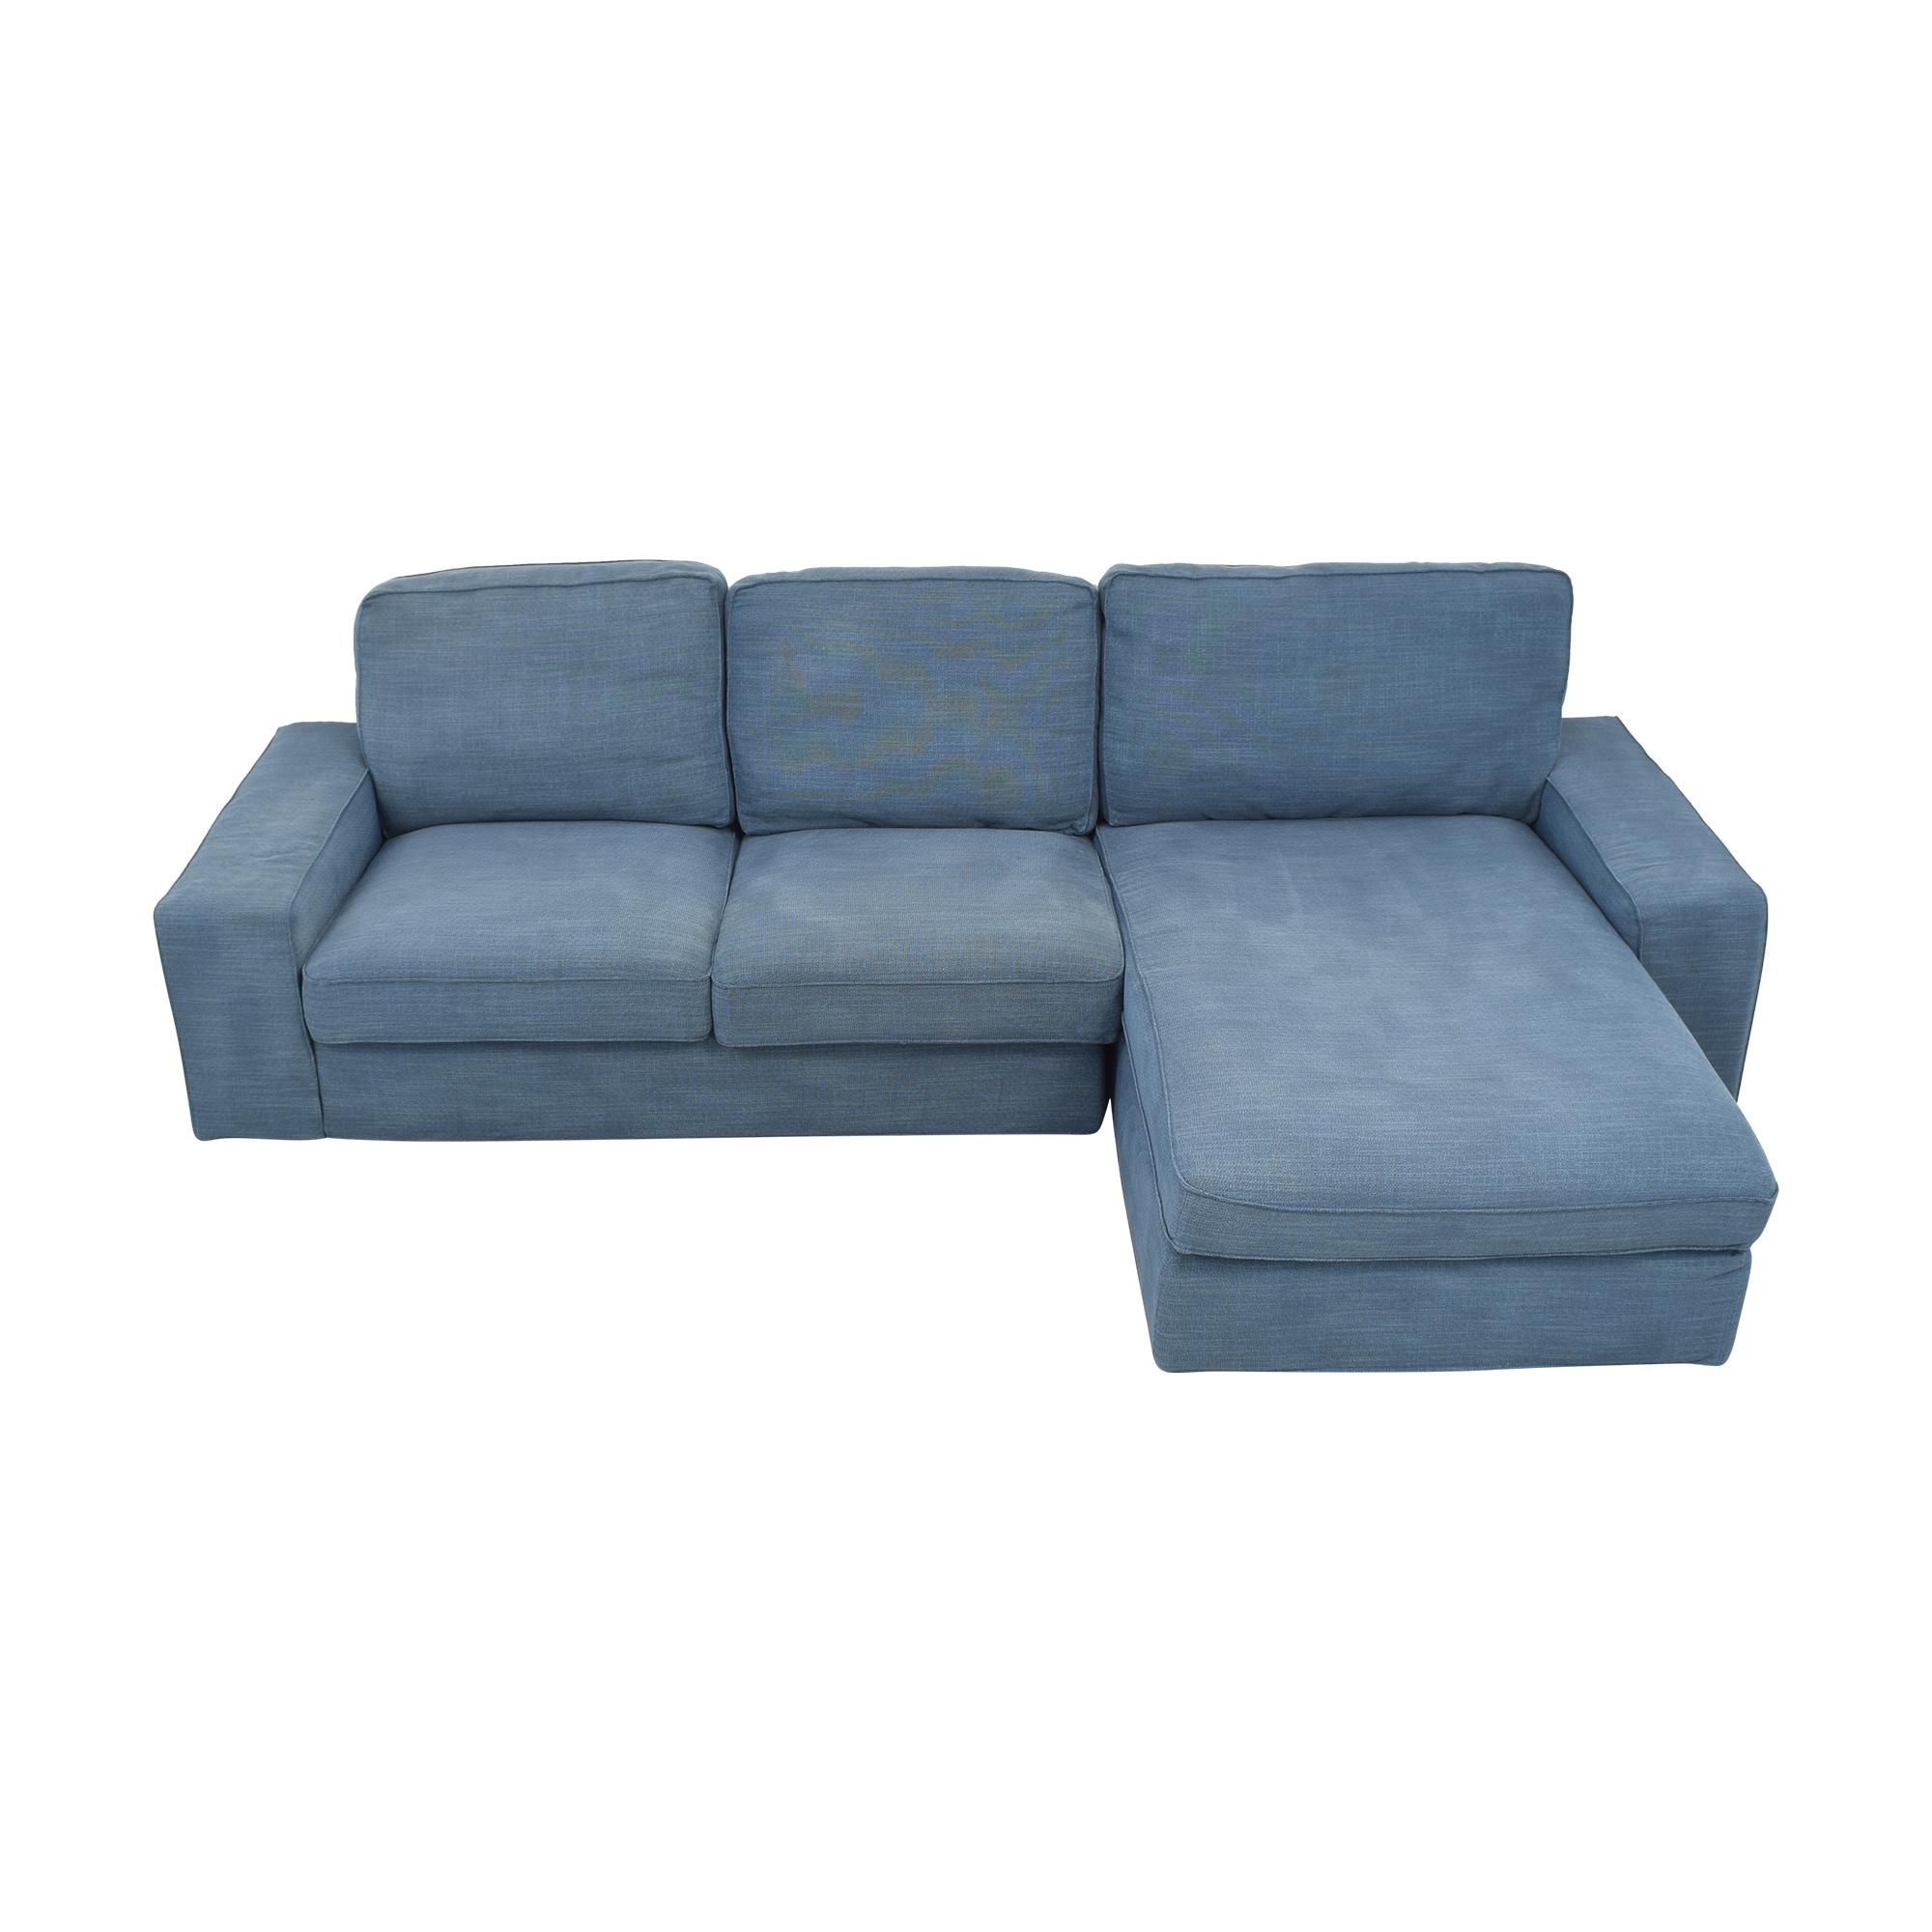 IKEA Kivik Sofa with Chaise IKEA